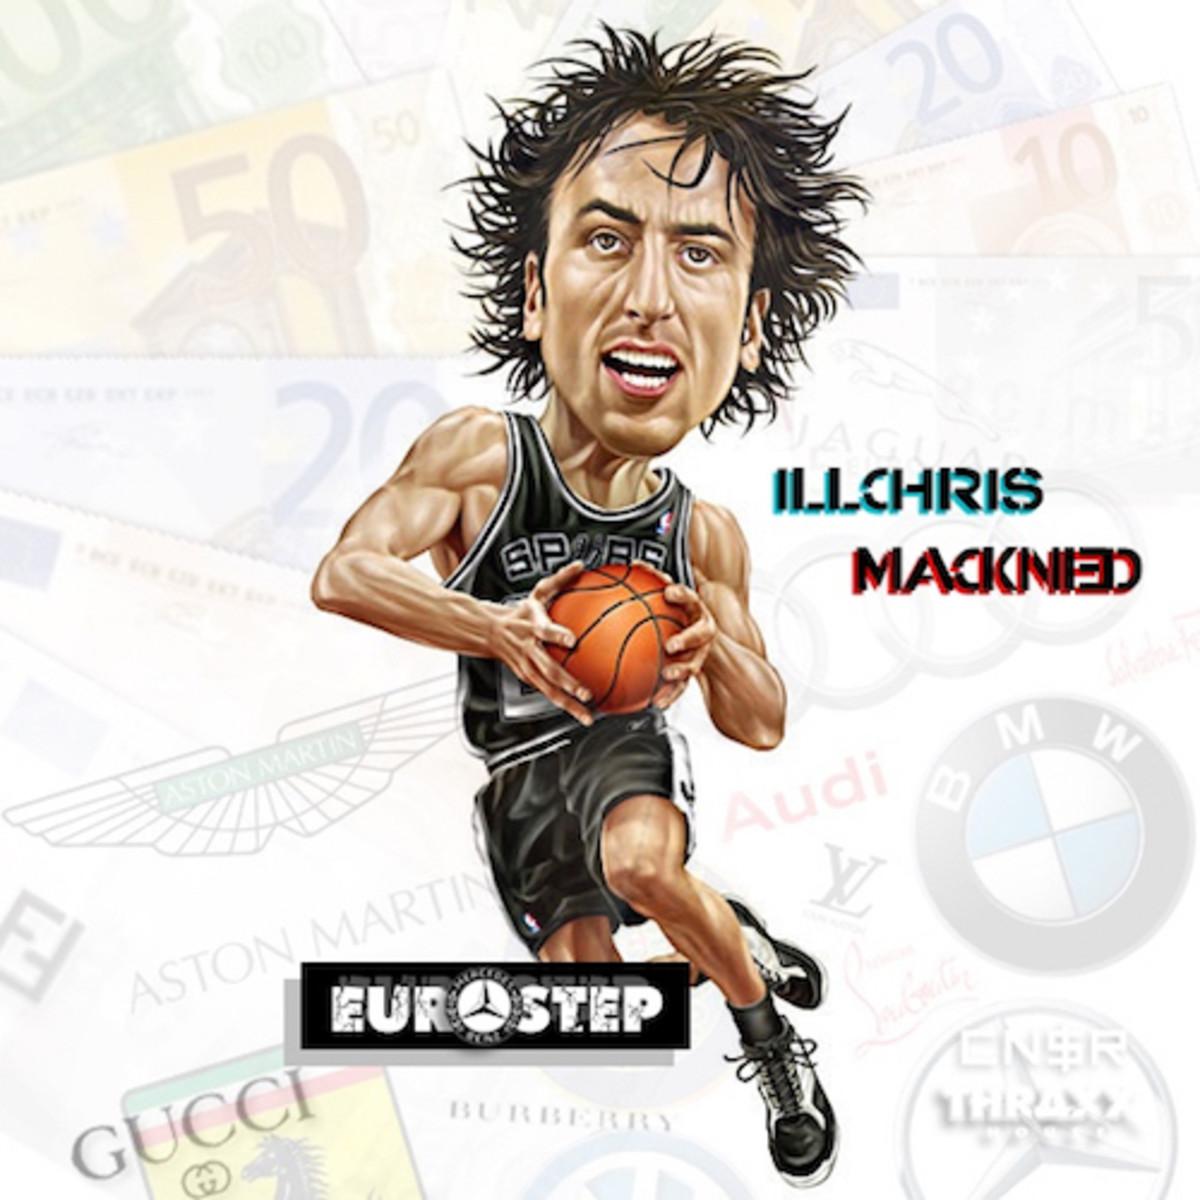 ill-chris-eurostep.jpg